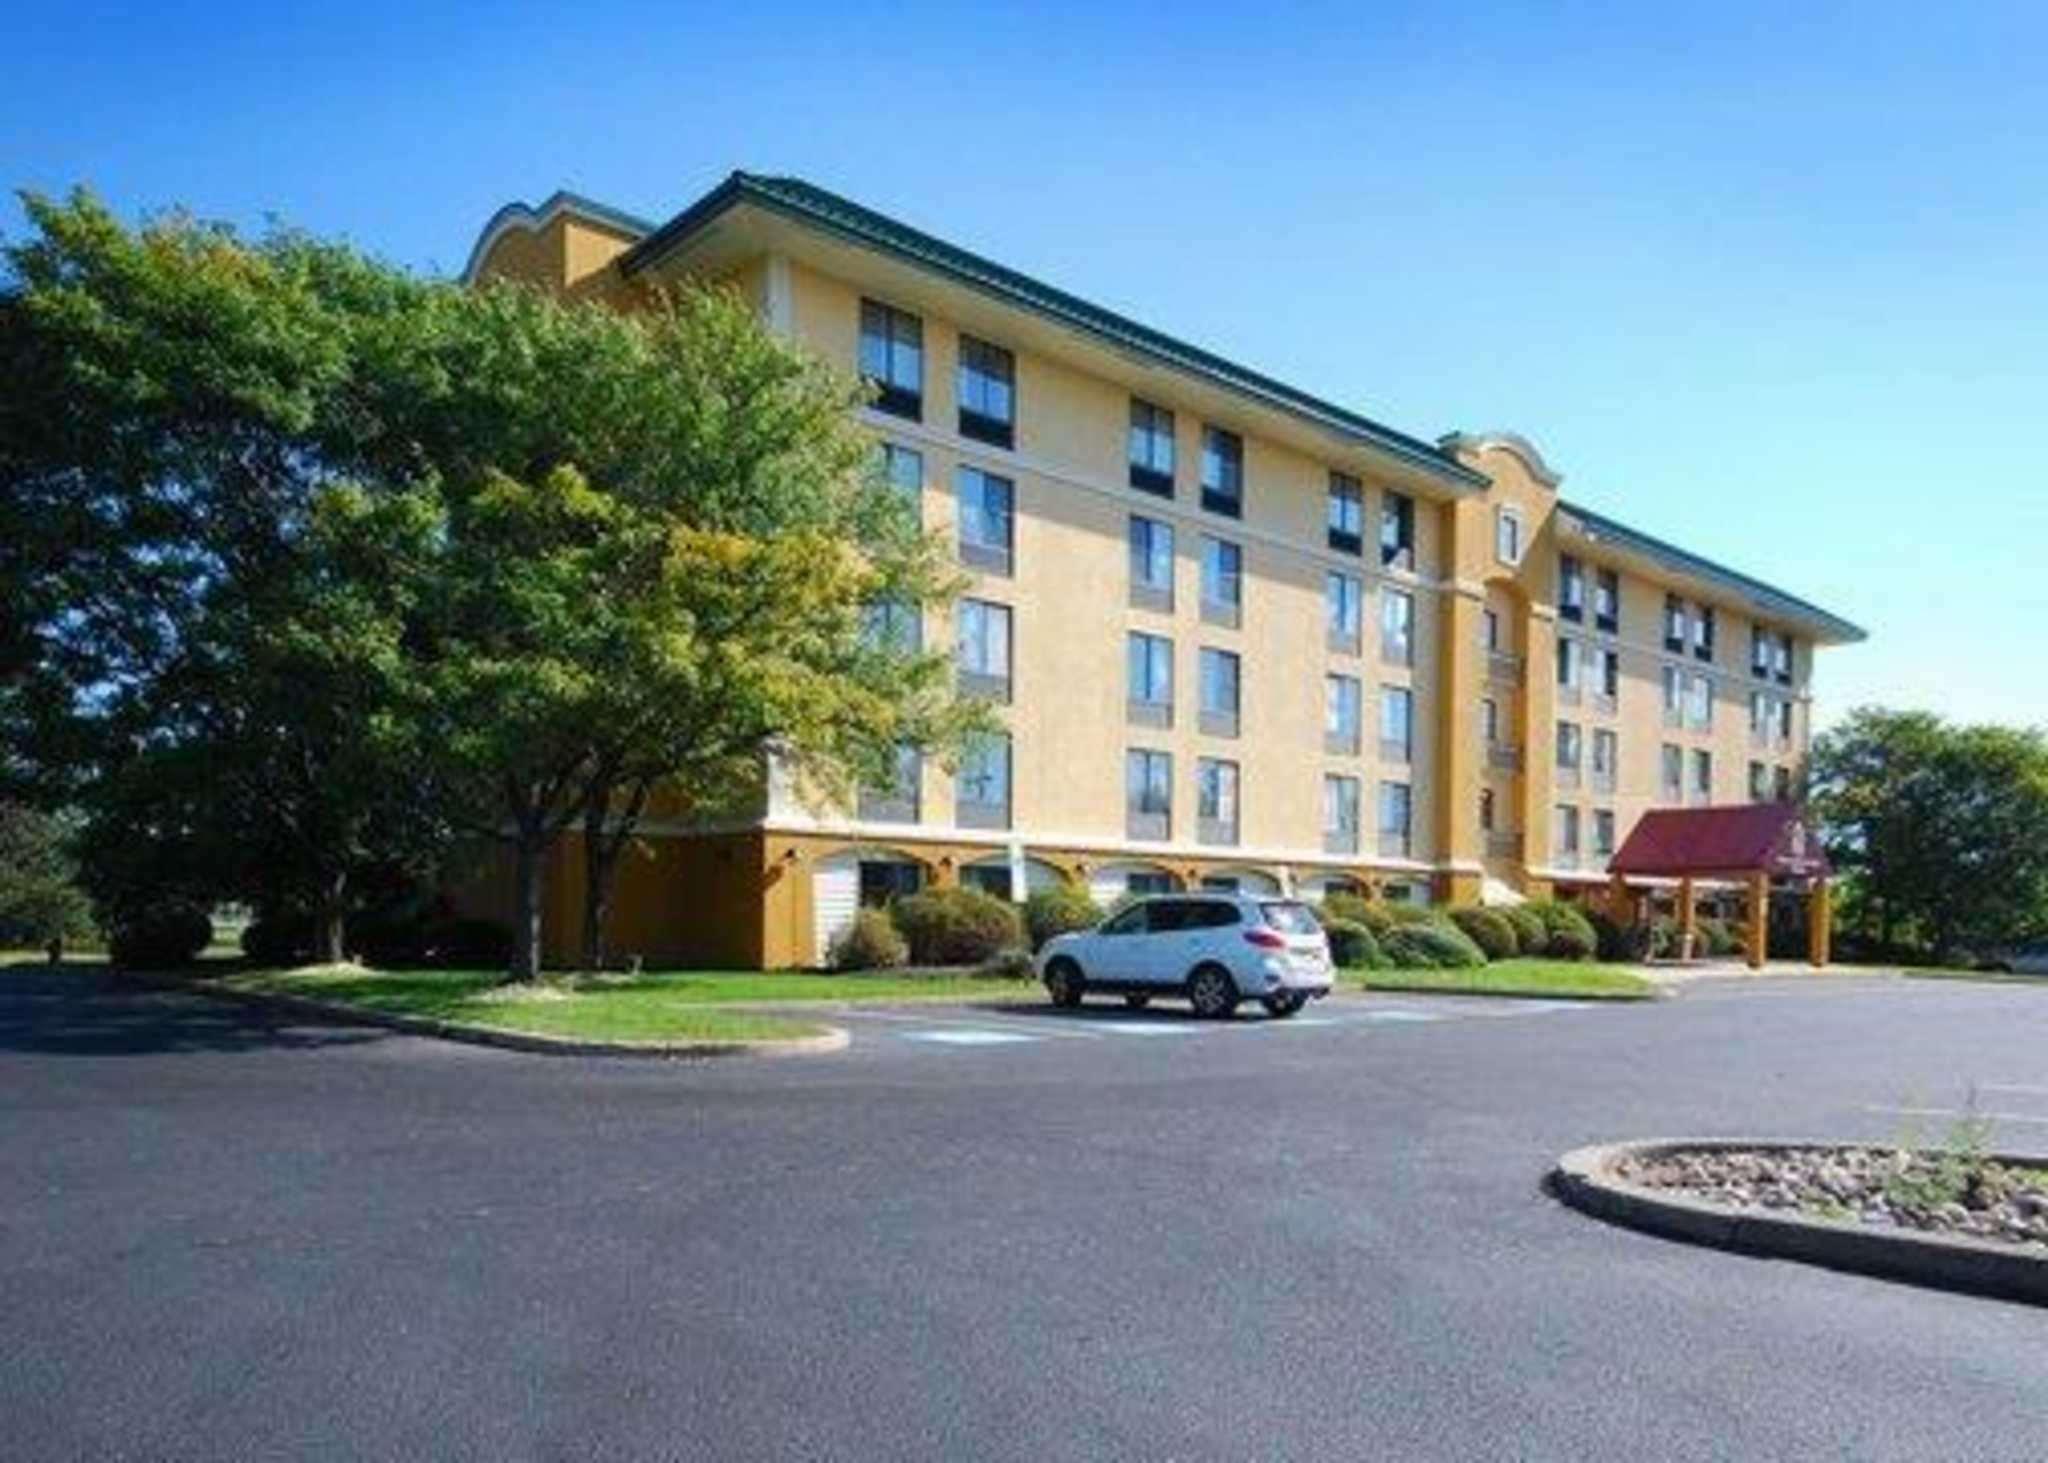 Quality Inn And Suites Bensalem